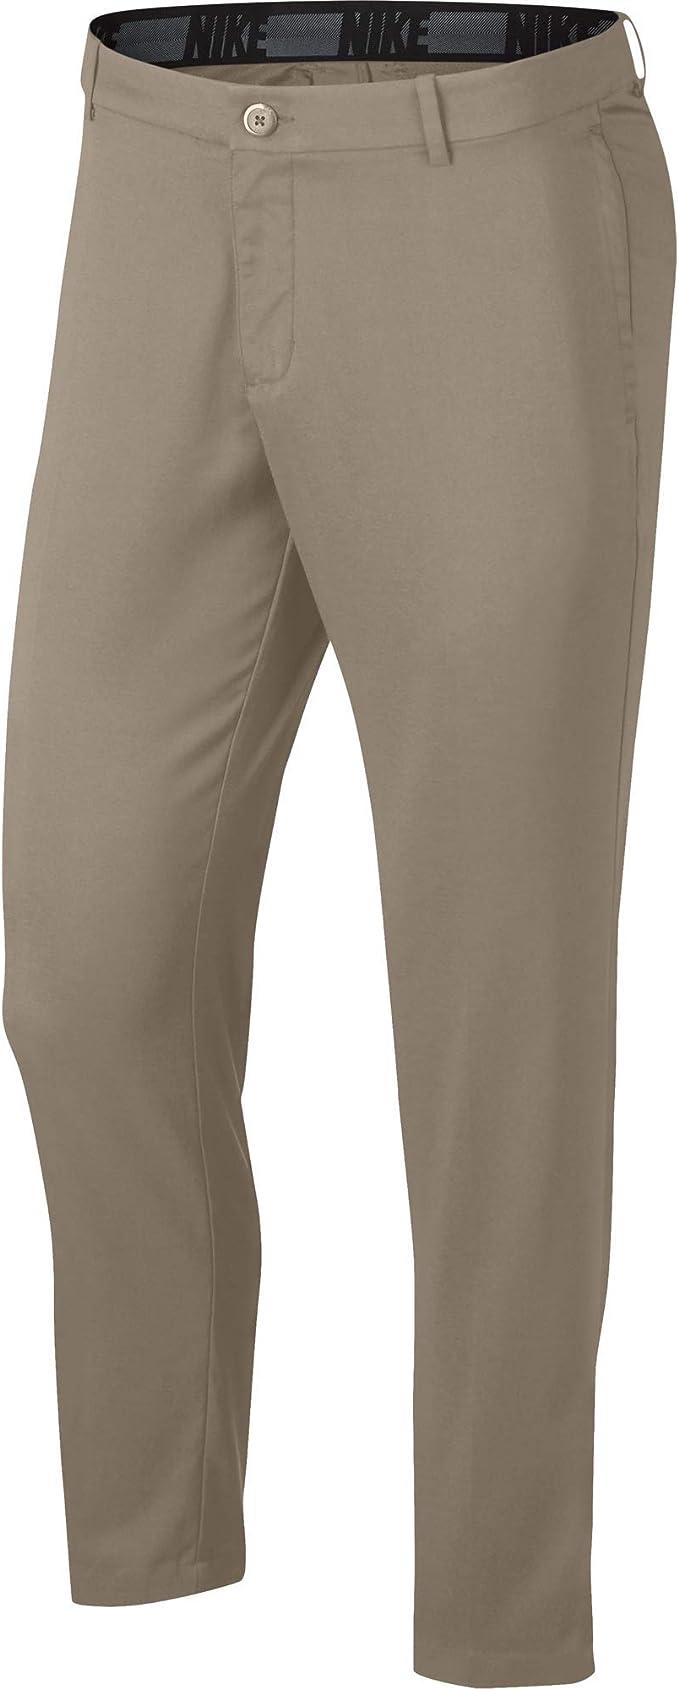 NIKE Men's Flex Core Pants